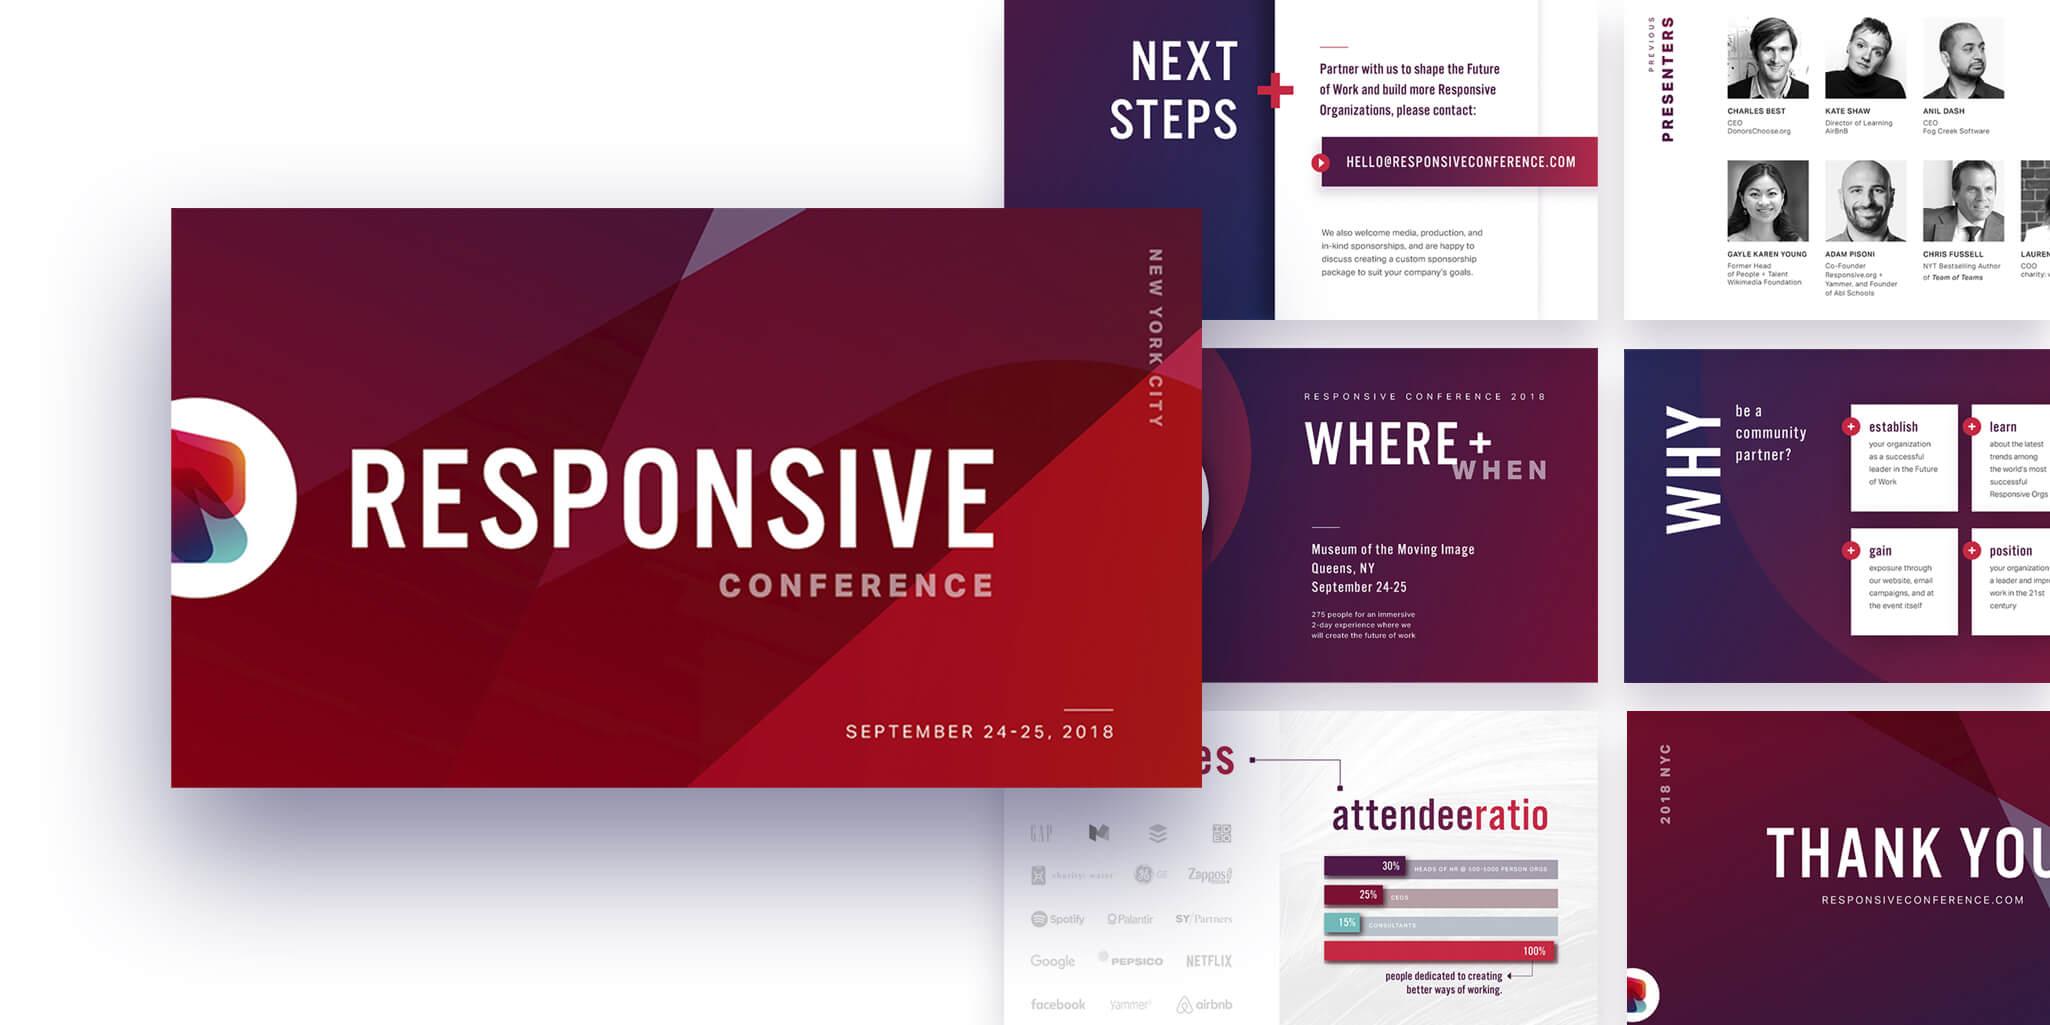 responsive conference partnership deck design